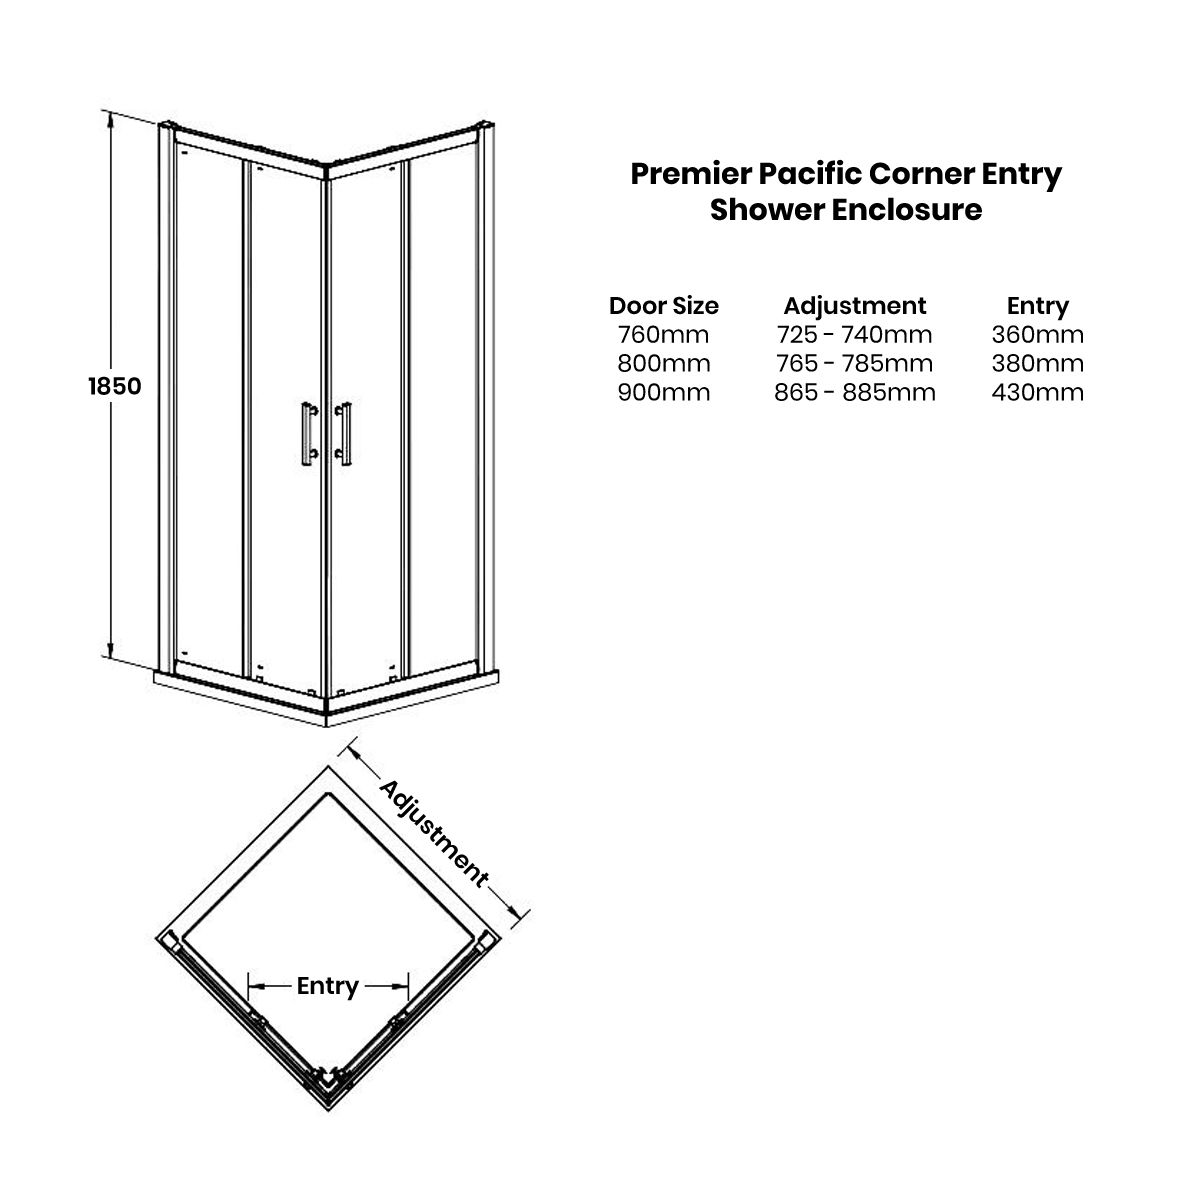 Nuie Pacific Corner Entry Shower Enclosure Dimensions